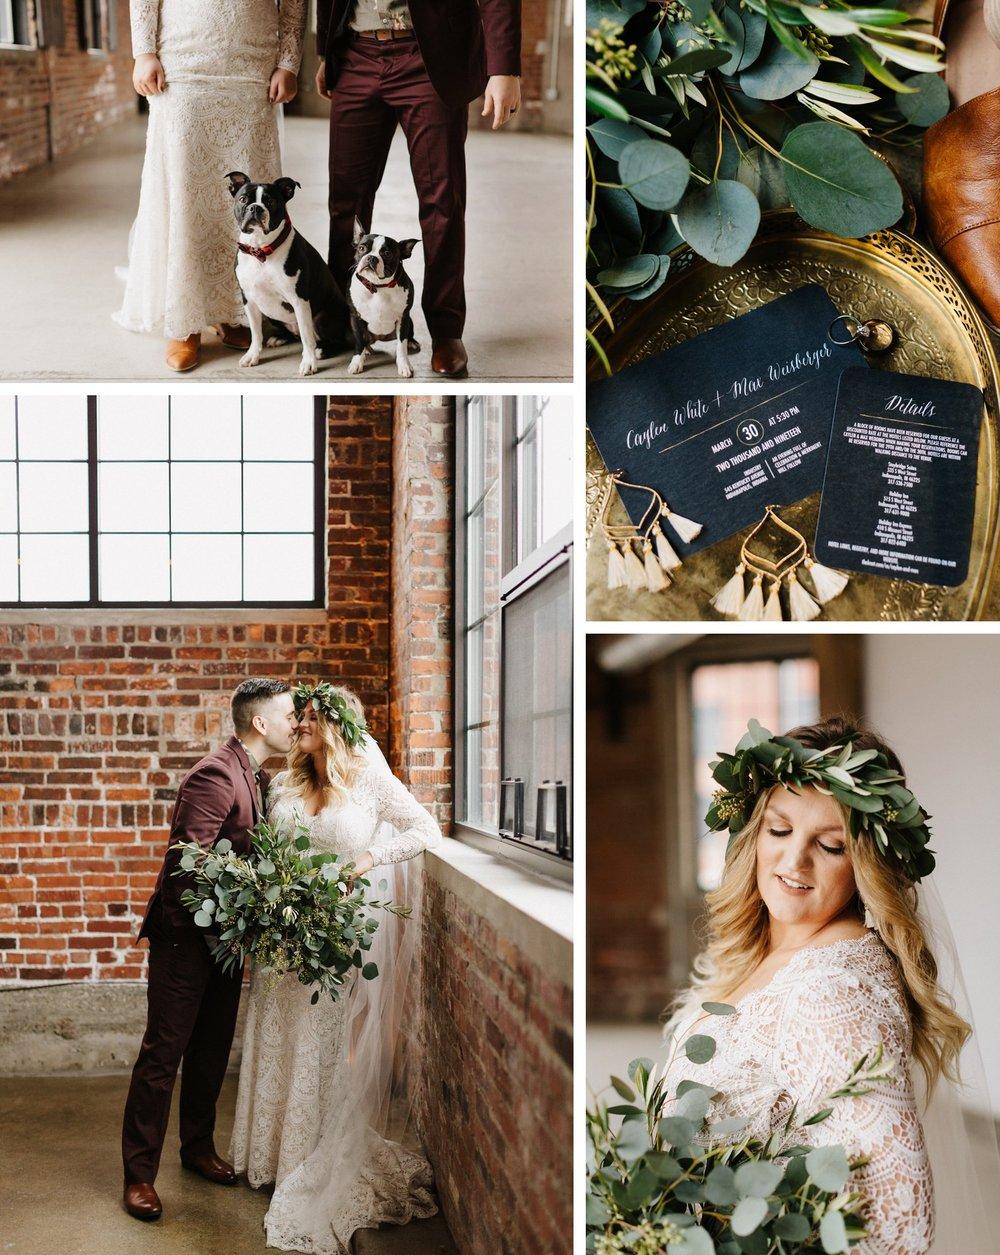 19-03-30 Caylen and Max Wedding Previews-44_WEB.jpg